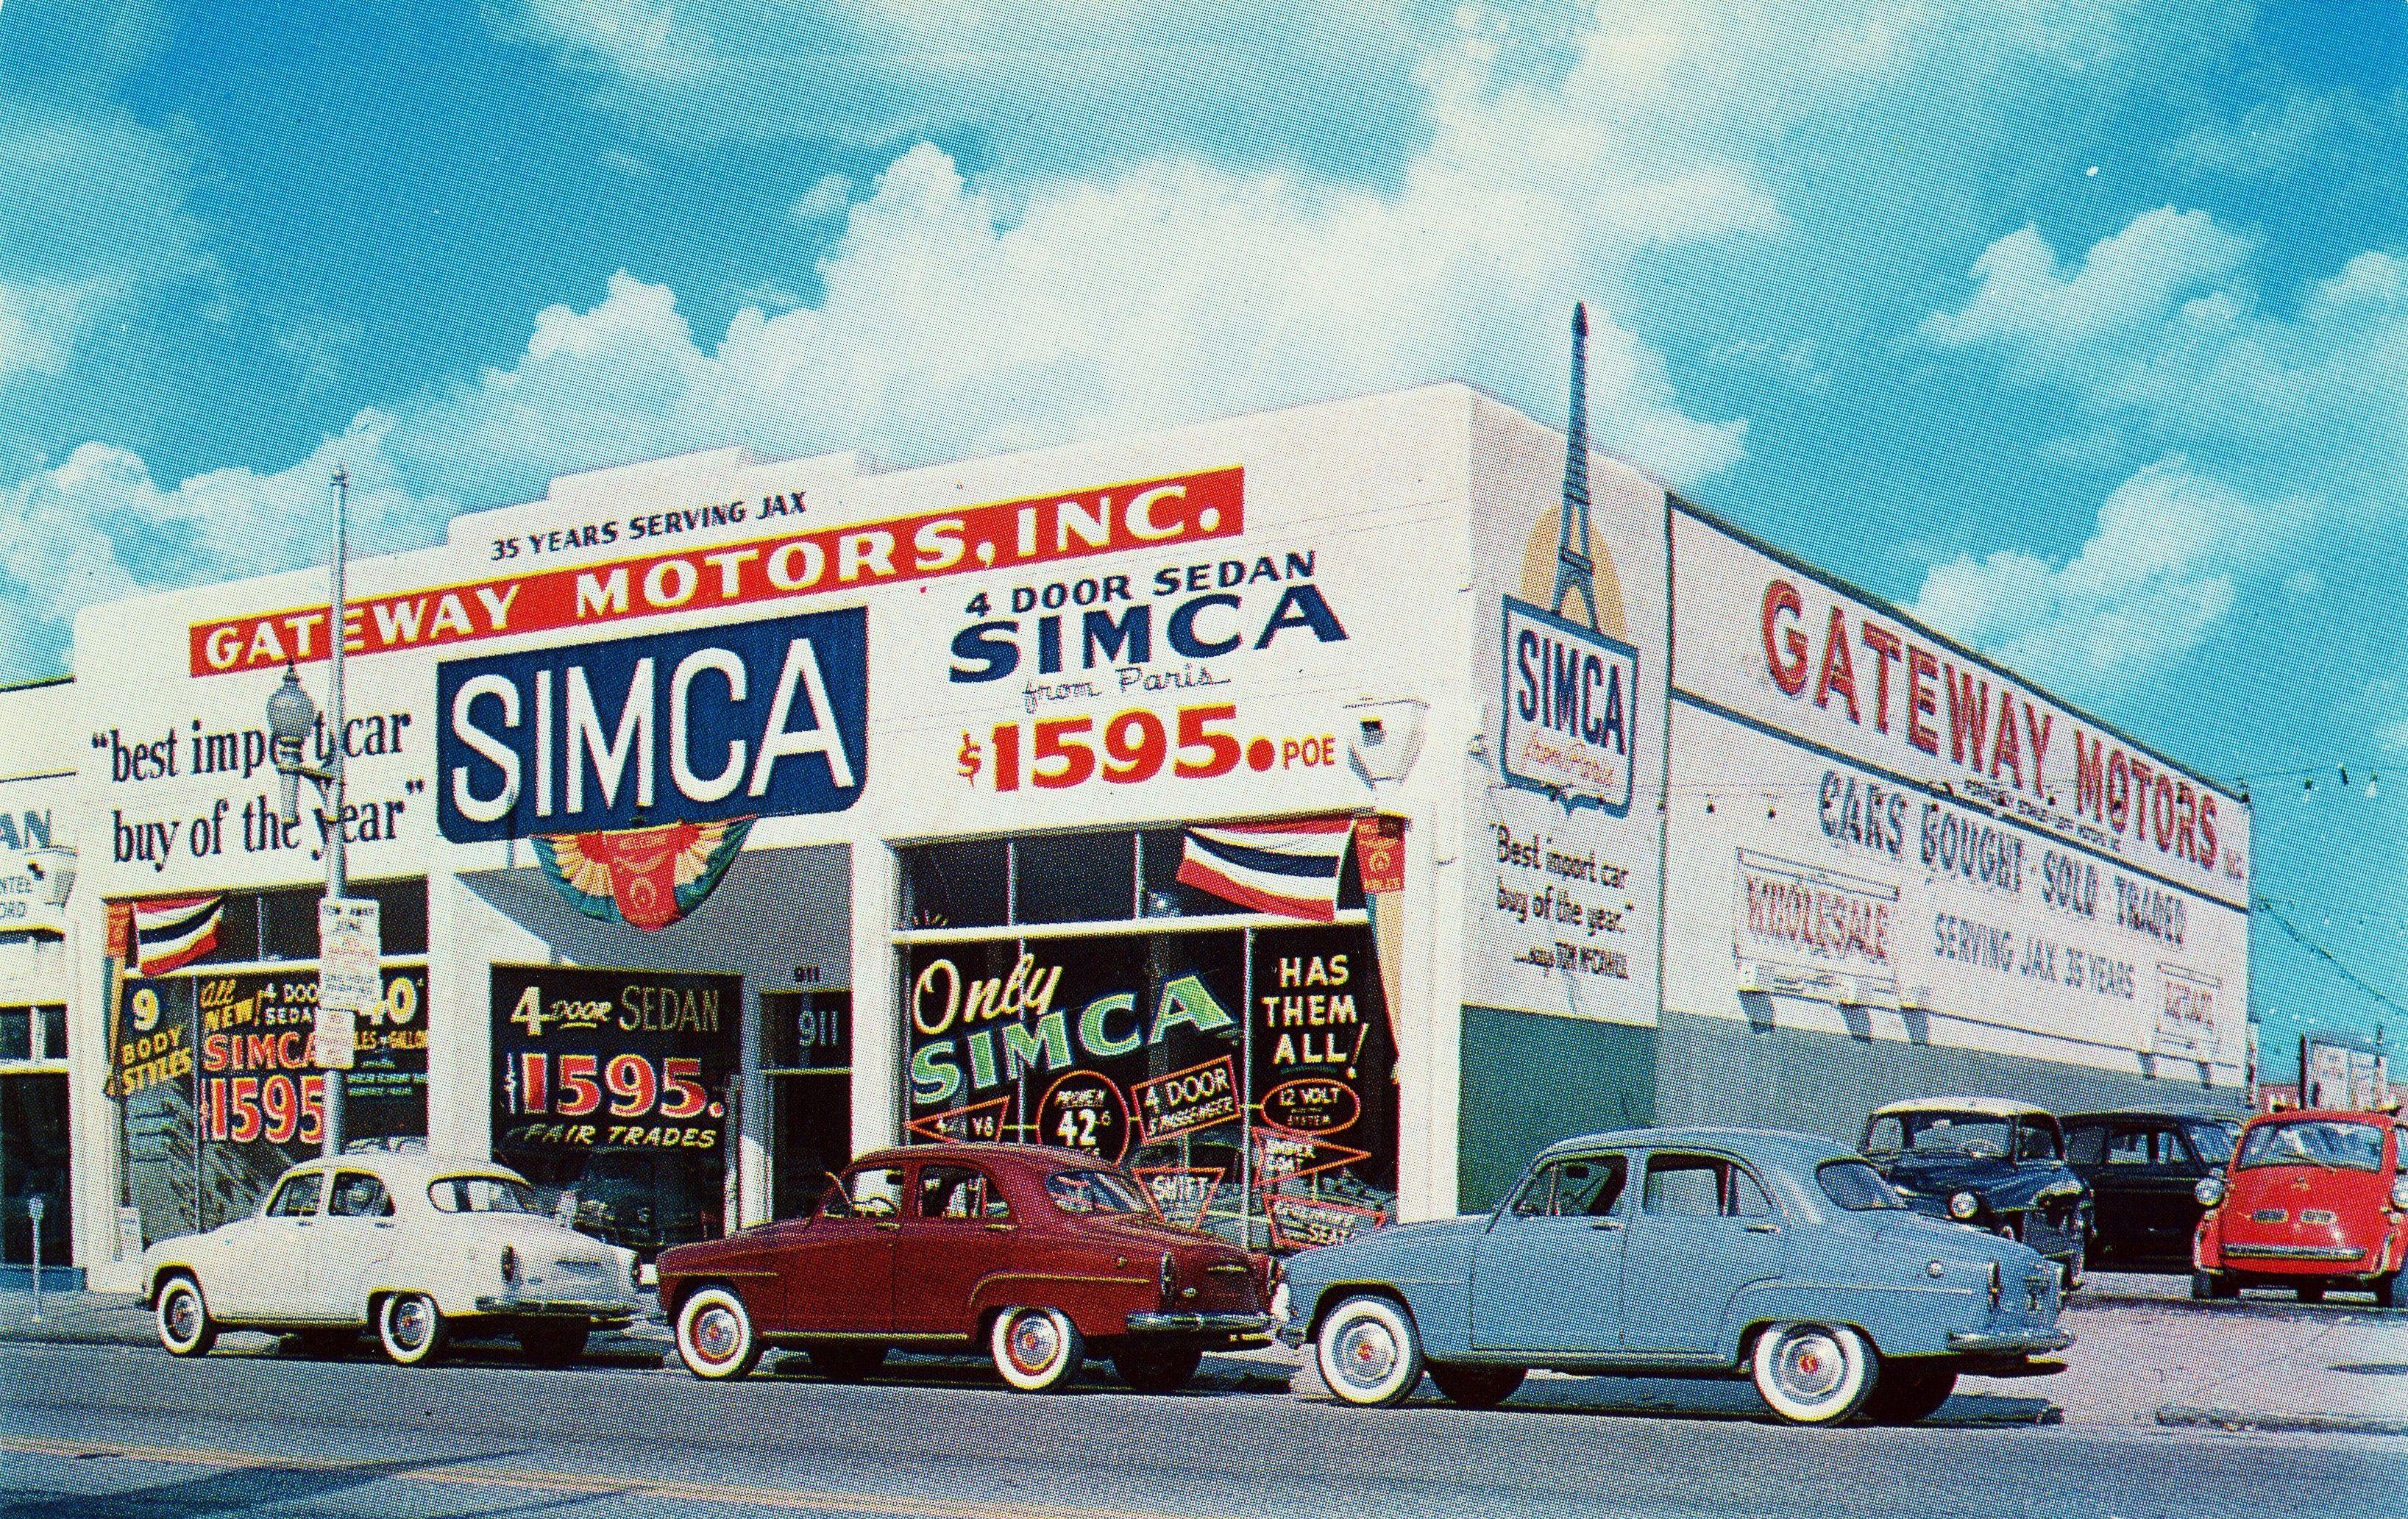 Gateway Motors Inc Simca dealership in Jacksonville Florida in